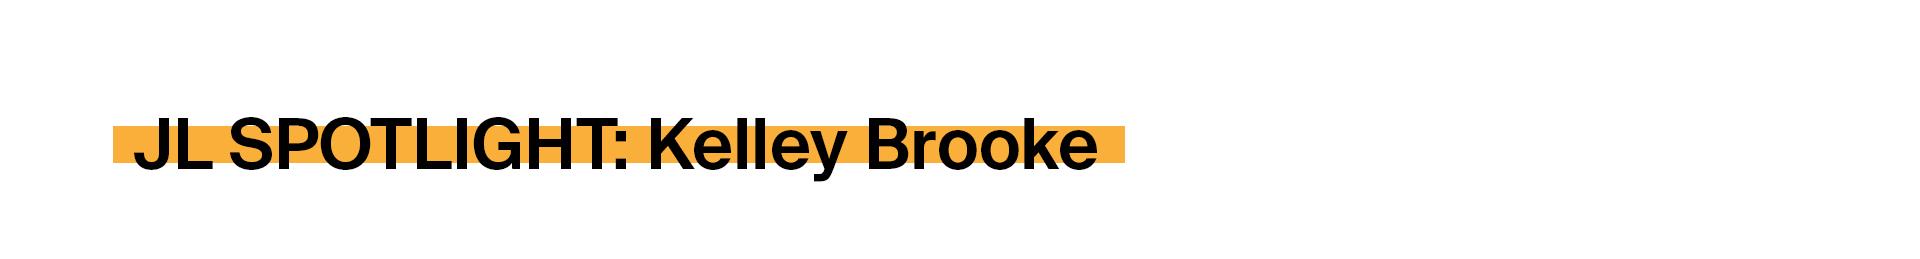 Kelley Brooke Row1